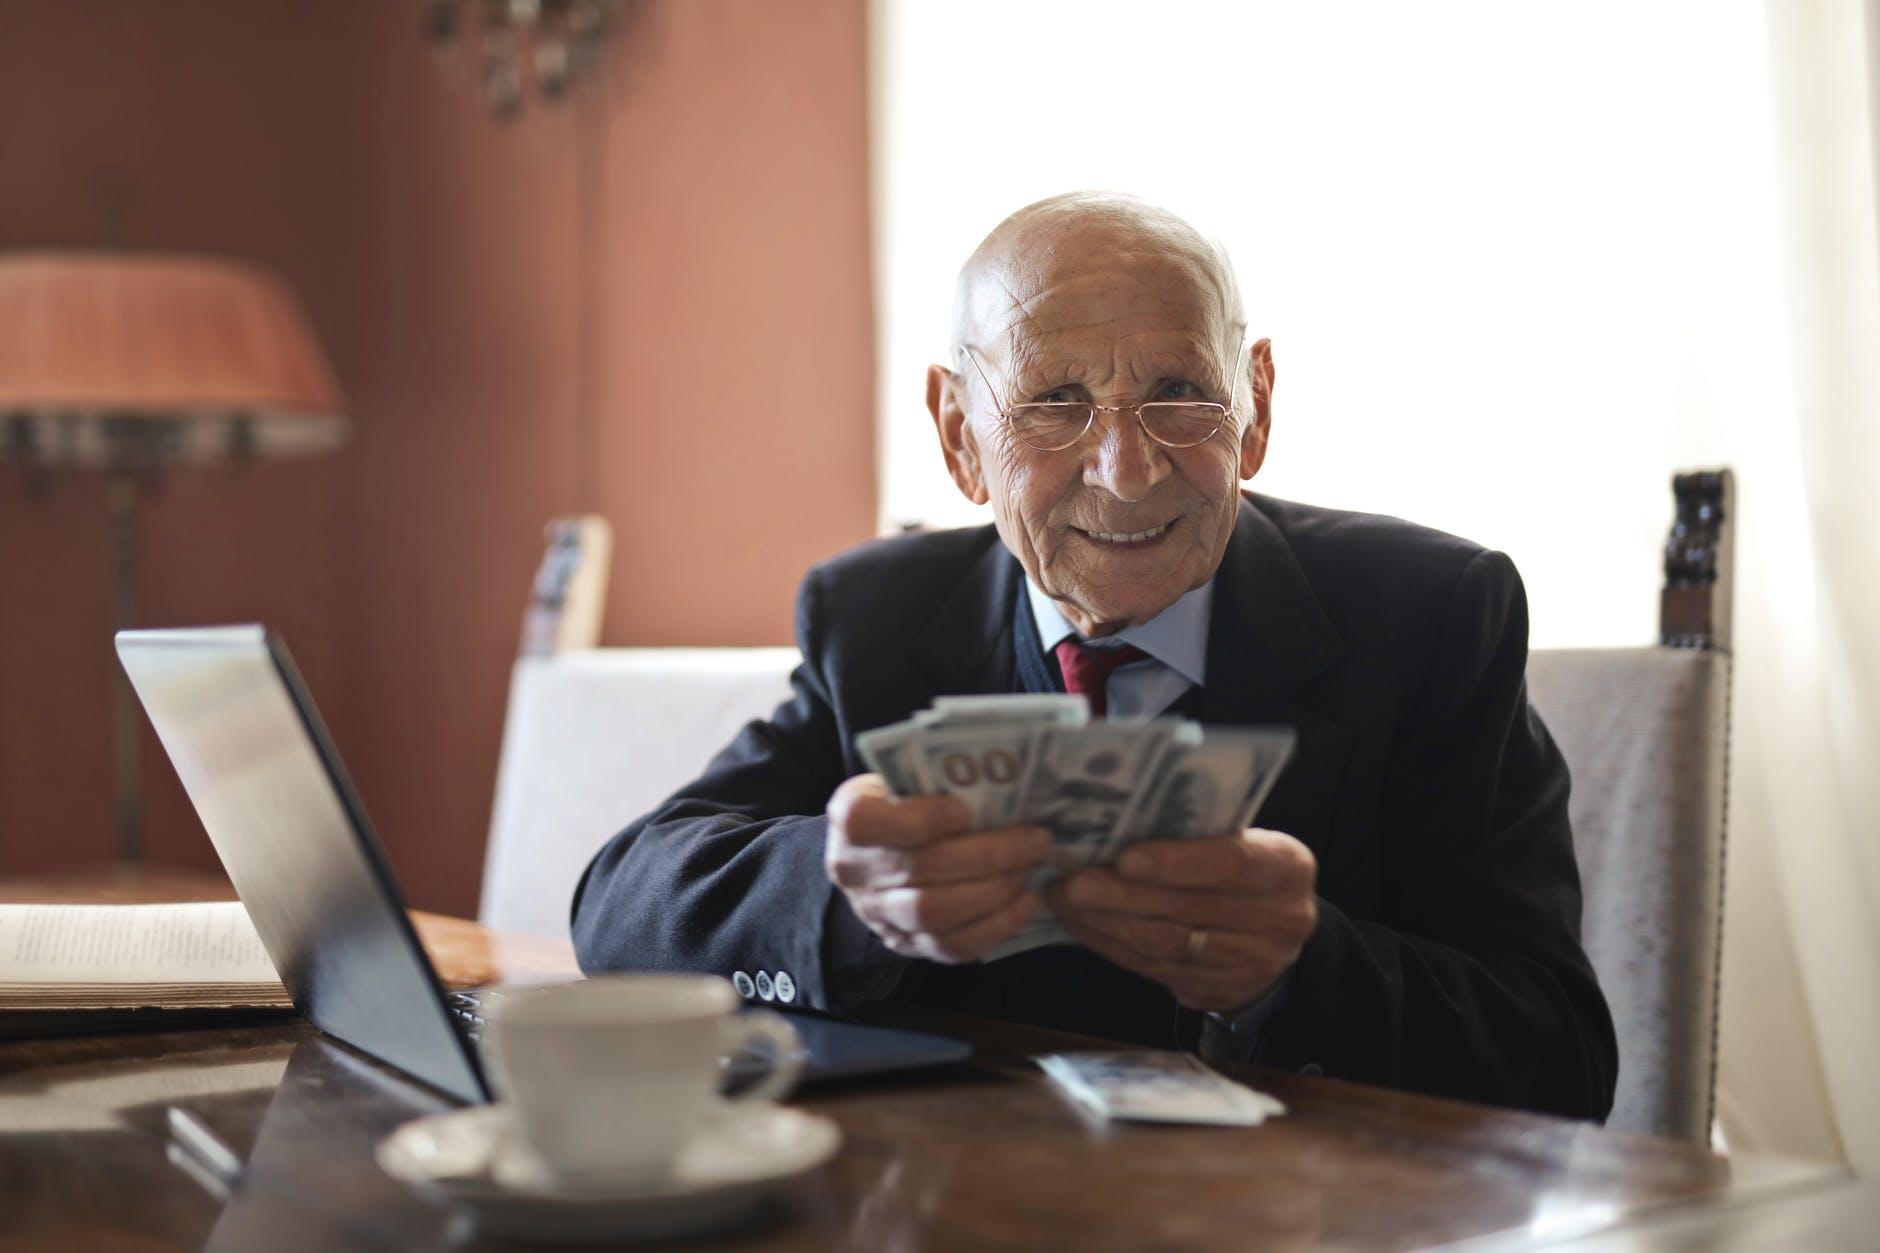 Positive people live longer.